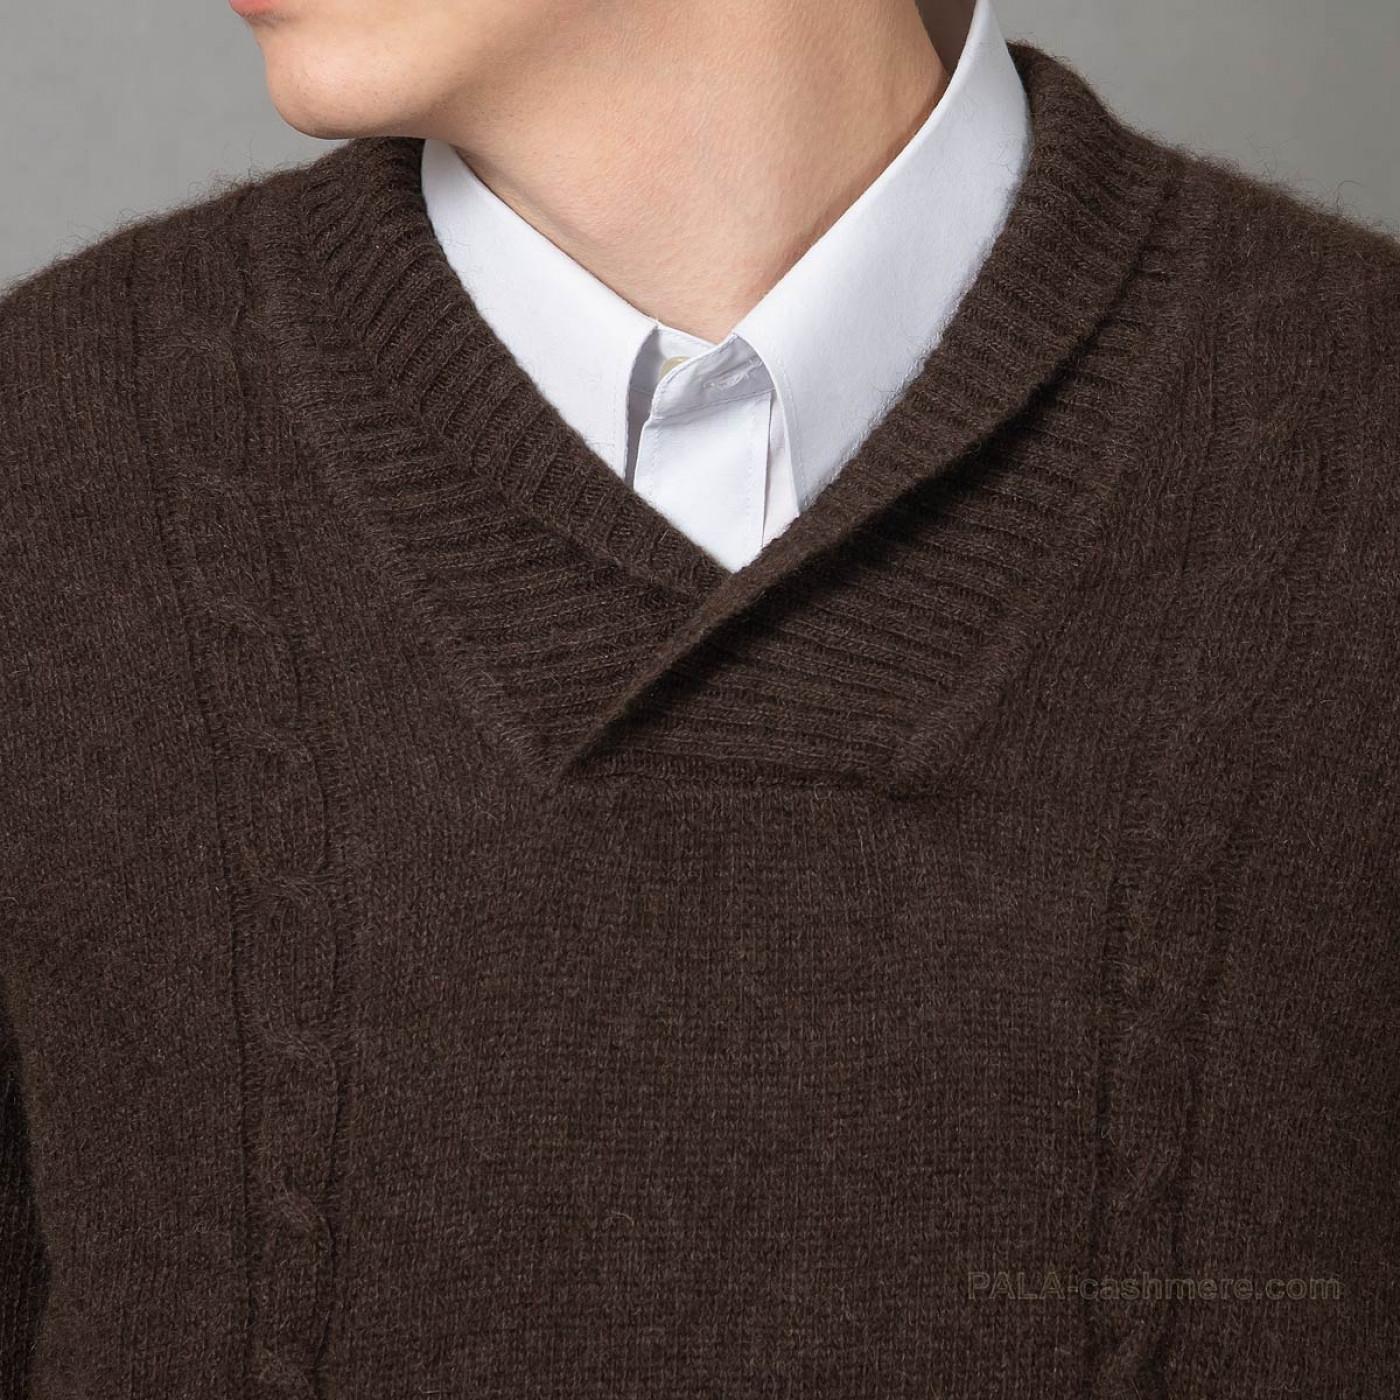 Пуловер из шерсти яка коричневый